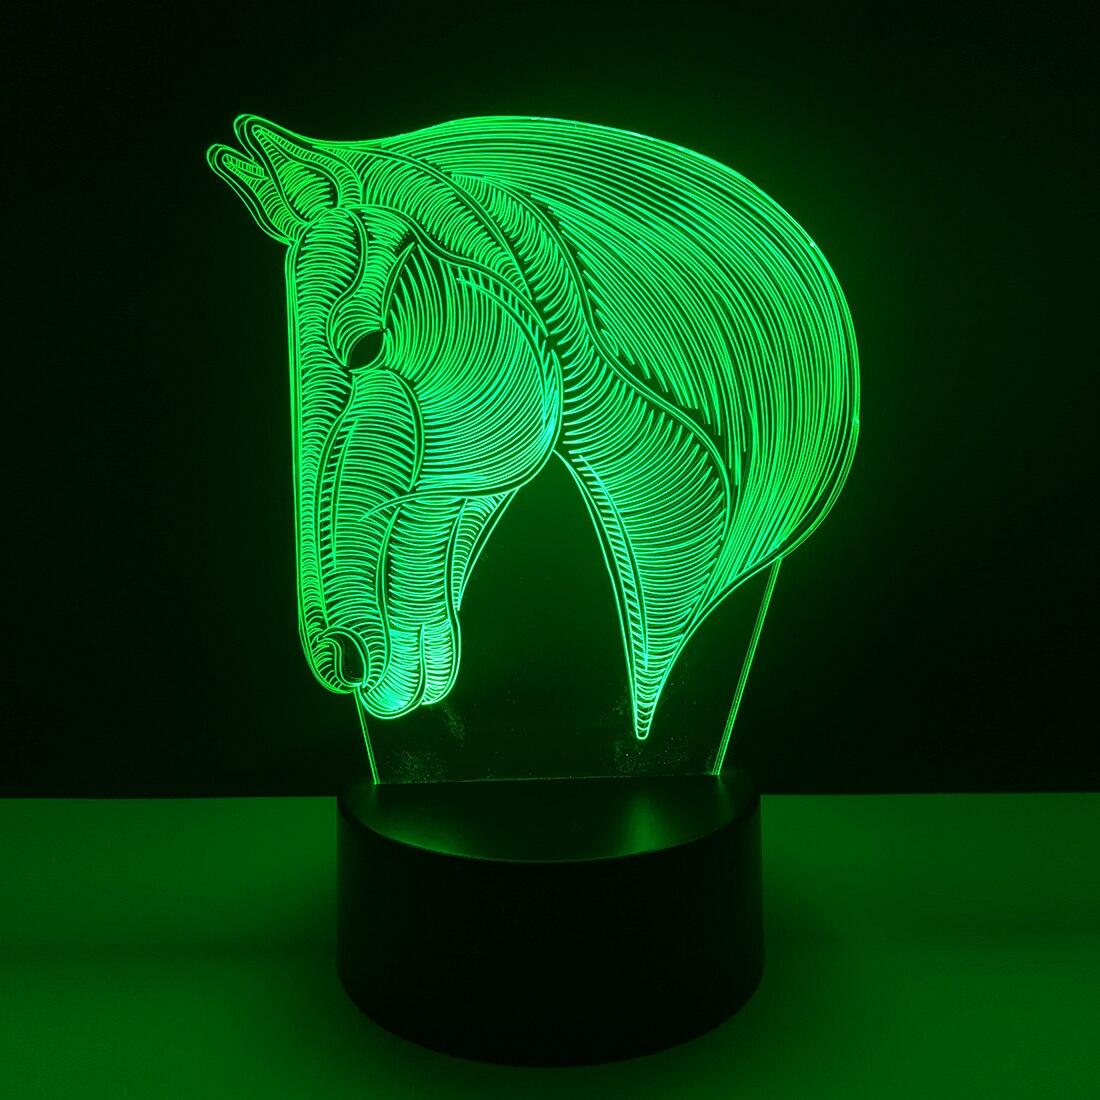 7 cores Mudando Animais Mesa USB Lâmpada de Mesa luz CONDUZIDA Da Noite Cavalo 3D Lampara Luces Navidad Miúdo Dormir Novidade Nightlight